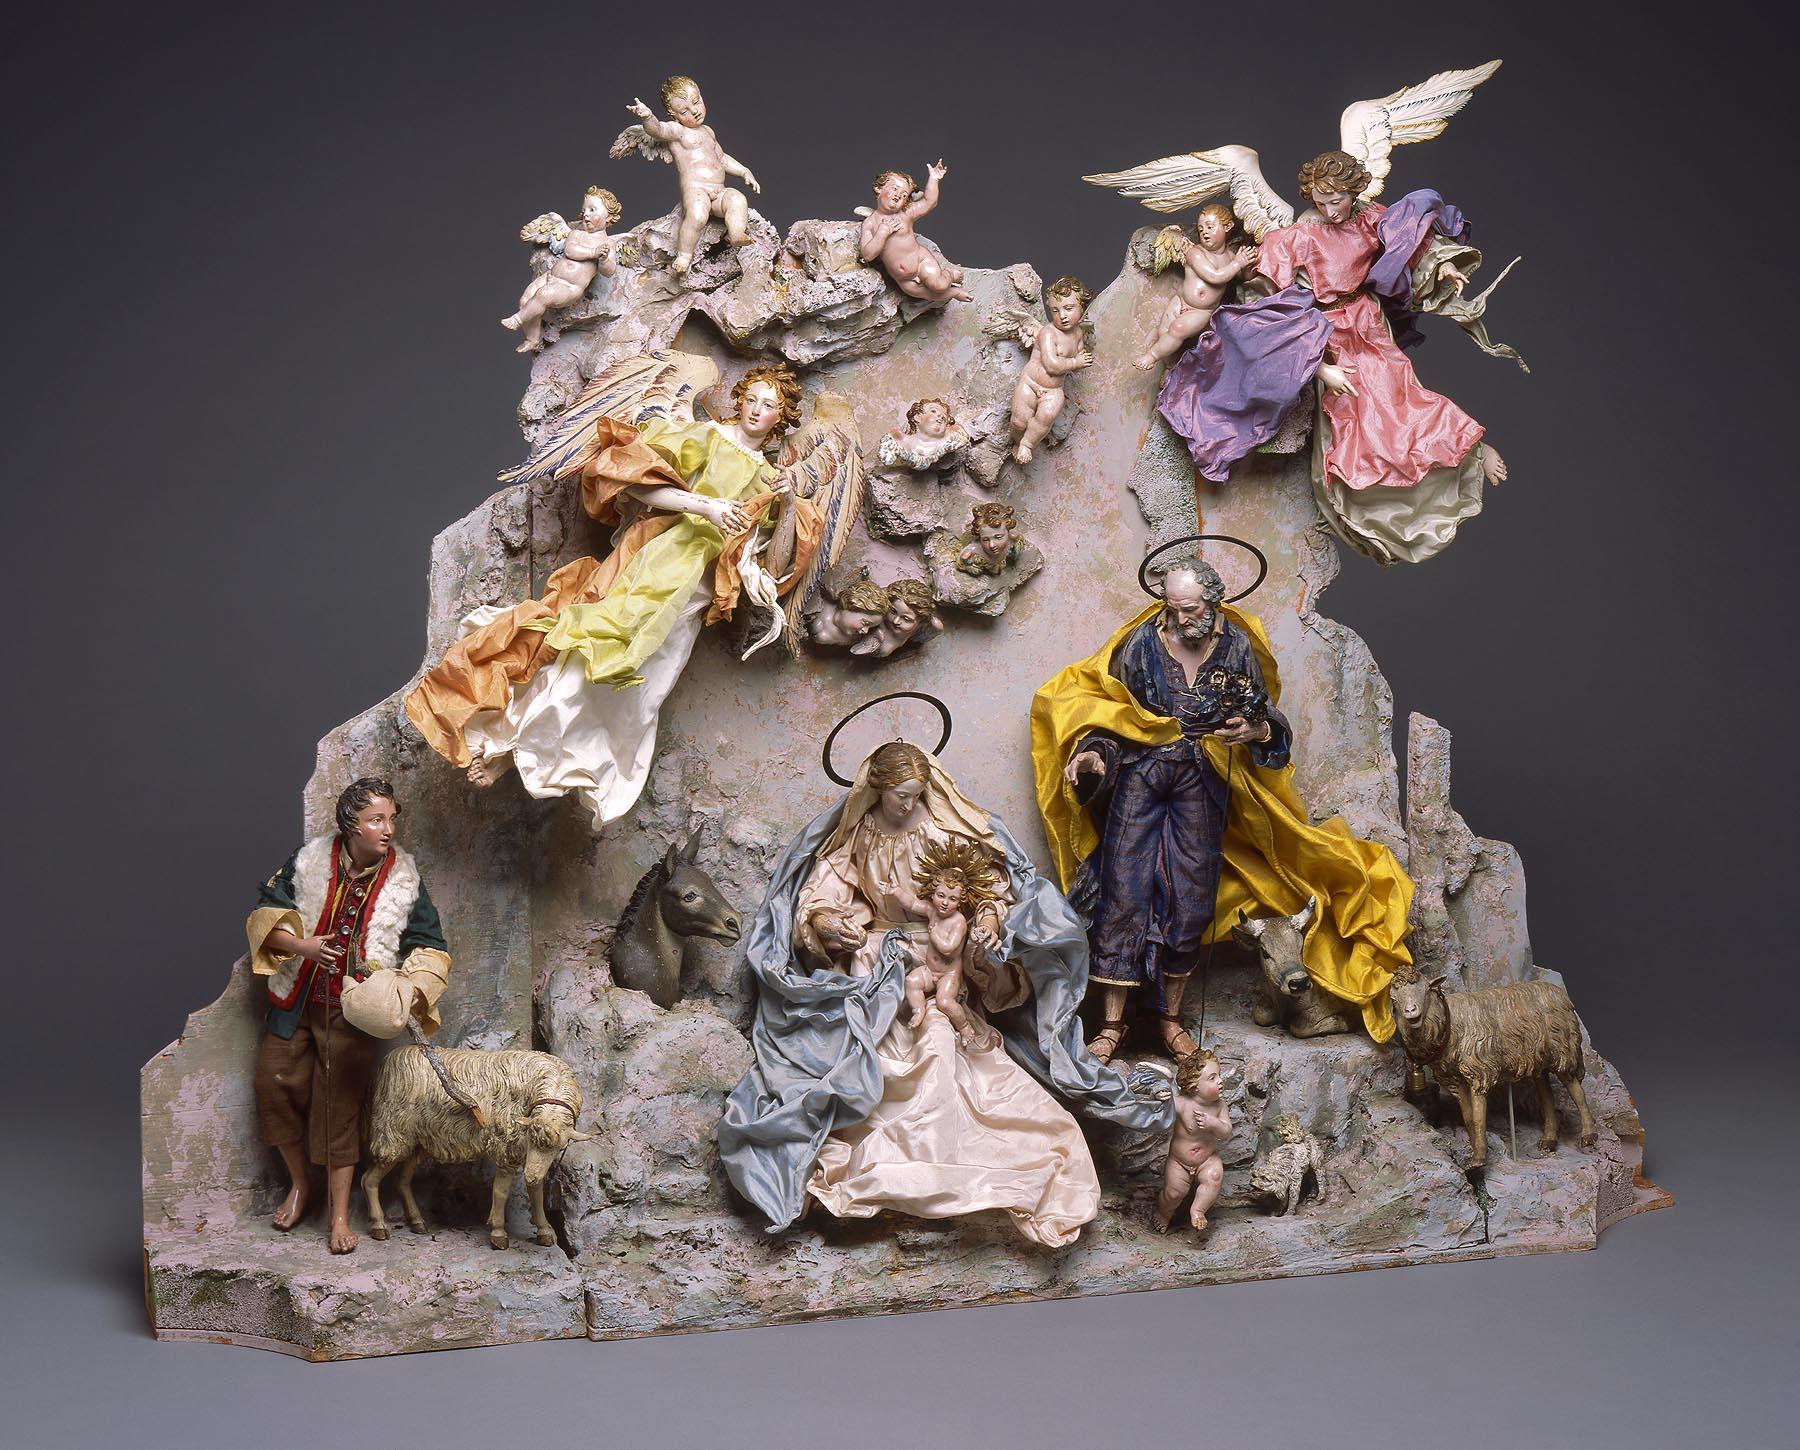 Naples Italy, Nativity Scene (Crèche), mid 1700s. Milwaukee Art Museum, Gift of Loretta Howard Sturgis. Photo by John R. Glembin.